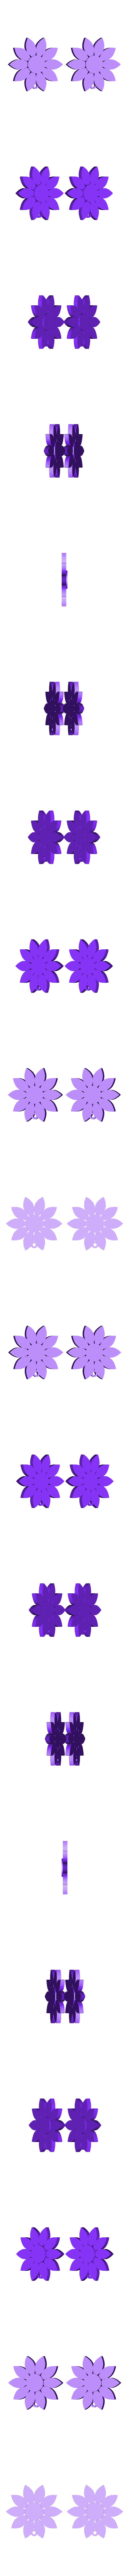 sunflowers2.stl Download free STL file Sunflowers Earrings • Object to 3D print, alberto_da_meduna